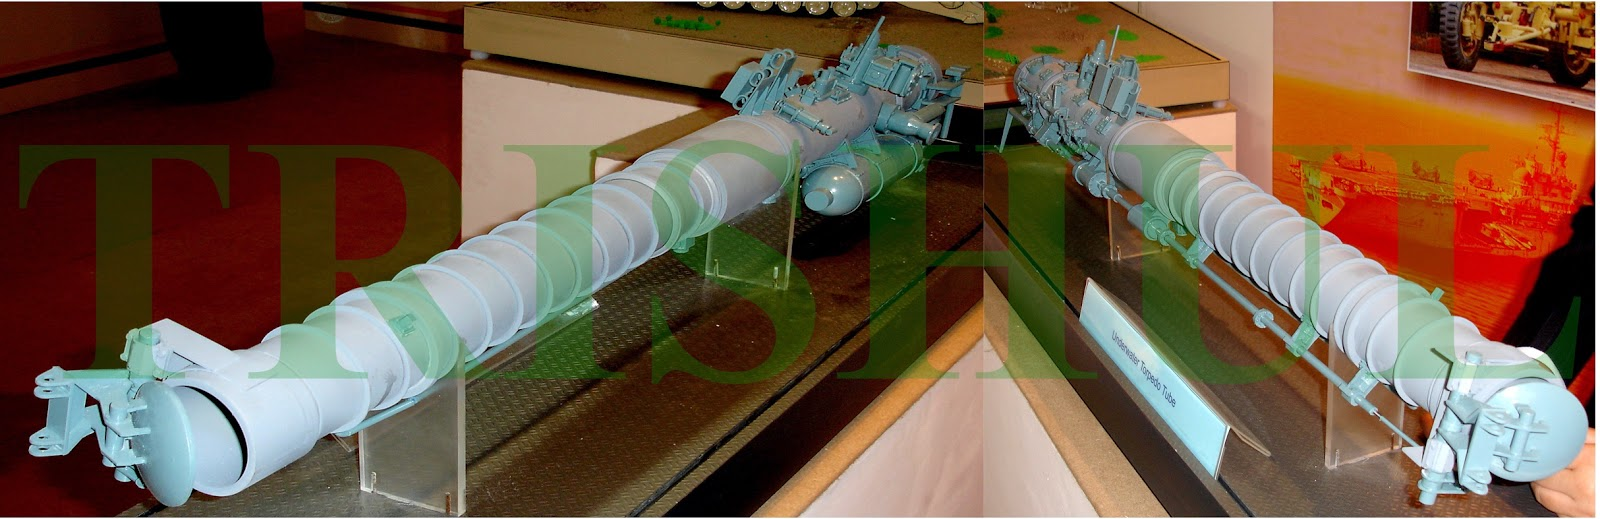 http://3.bp.blogspot.com/-wRgQbJKZkmI/VJY73bMx26I/AAAAAAAAIuU/IJhSkQdWFZM/s1600/L%2B%26%2BT-developed%2B533mm%2Btorpedo%2Blauncher%2Bfor%2BS-2%2BArihant%2BSSBN.jpg